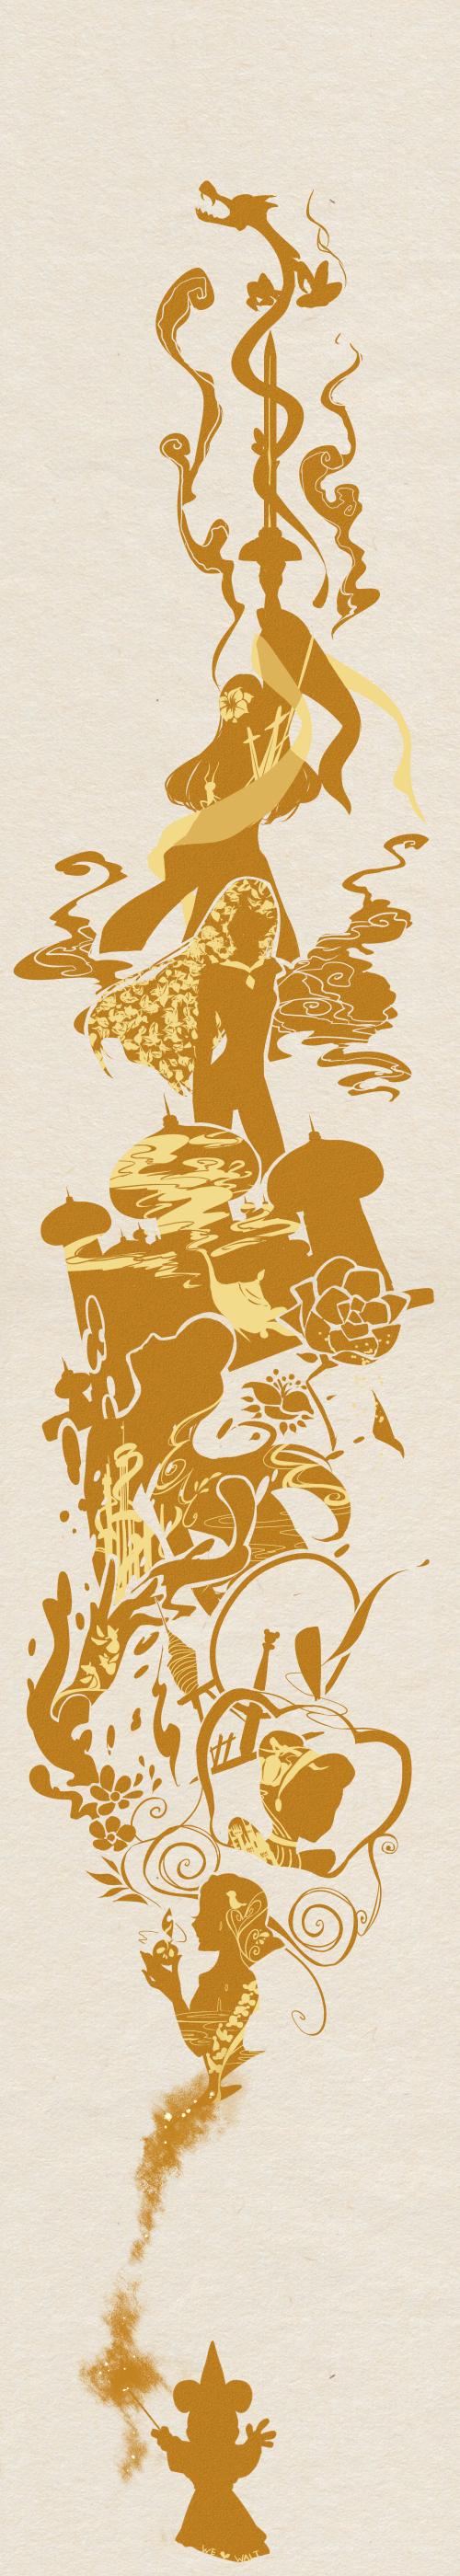 Tags: Anime, Izusetsu, Little Mermaid, Snow White and the Seven Dwarfs, Beauty and the Beast, Aladdin, Cinderella, Sleeping Beauty, Pocahontas, Snow White and the Seven Dwarfs (Disney), Sleeping Beauty (Disney), Mulan, Beauty and the Beast (Disney)